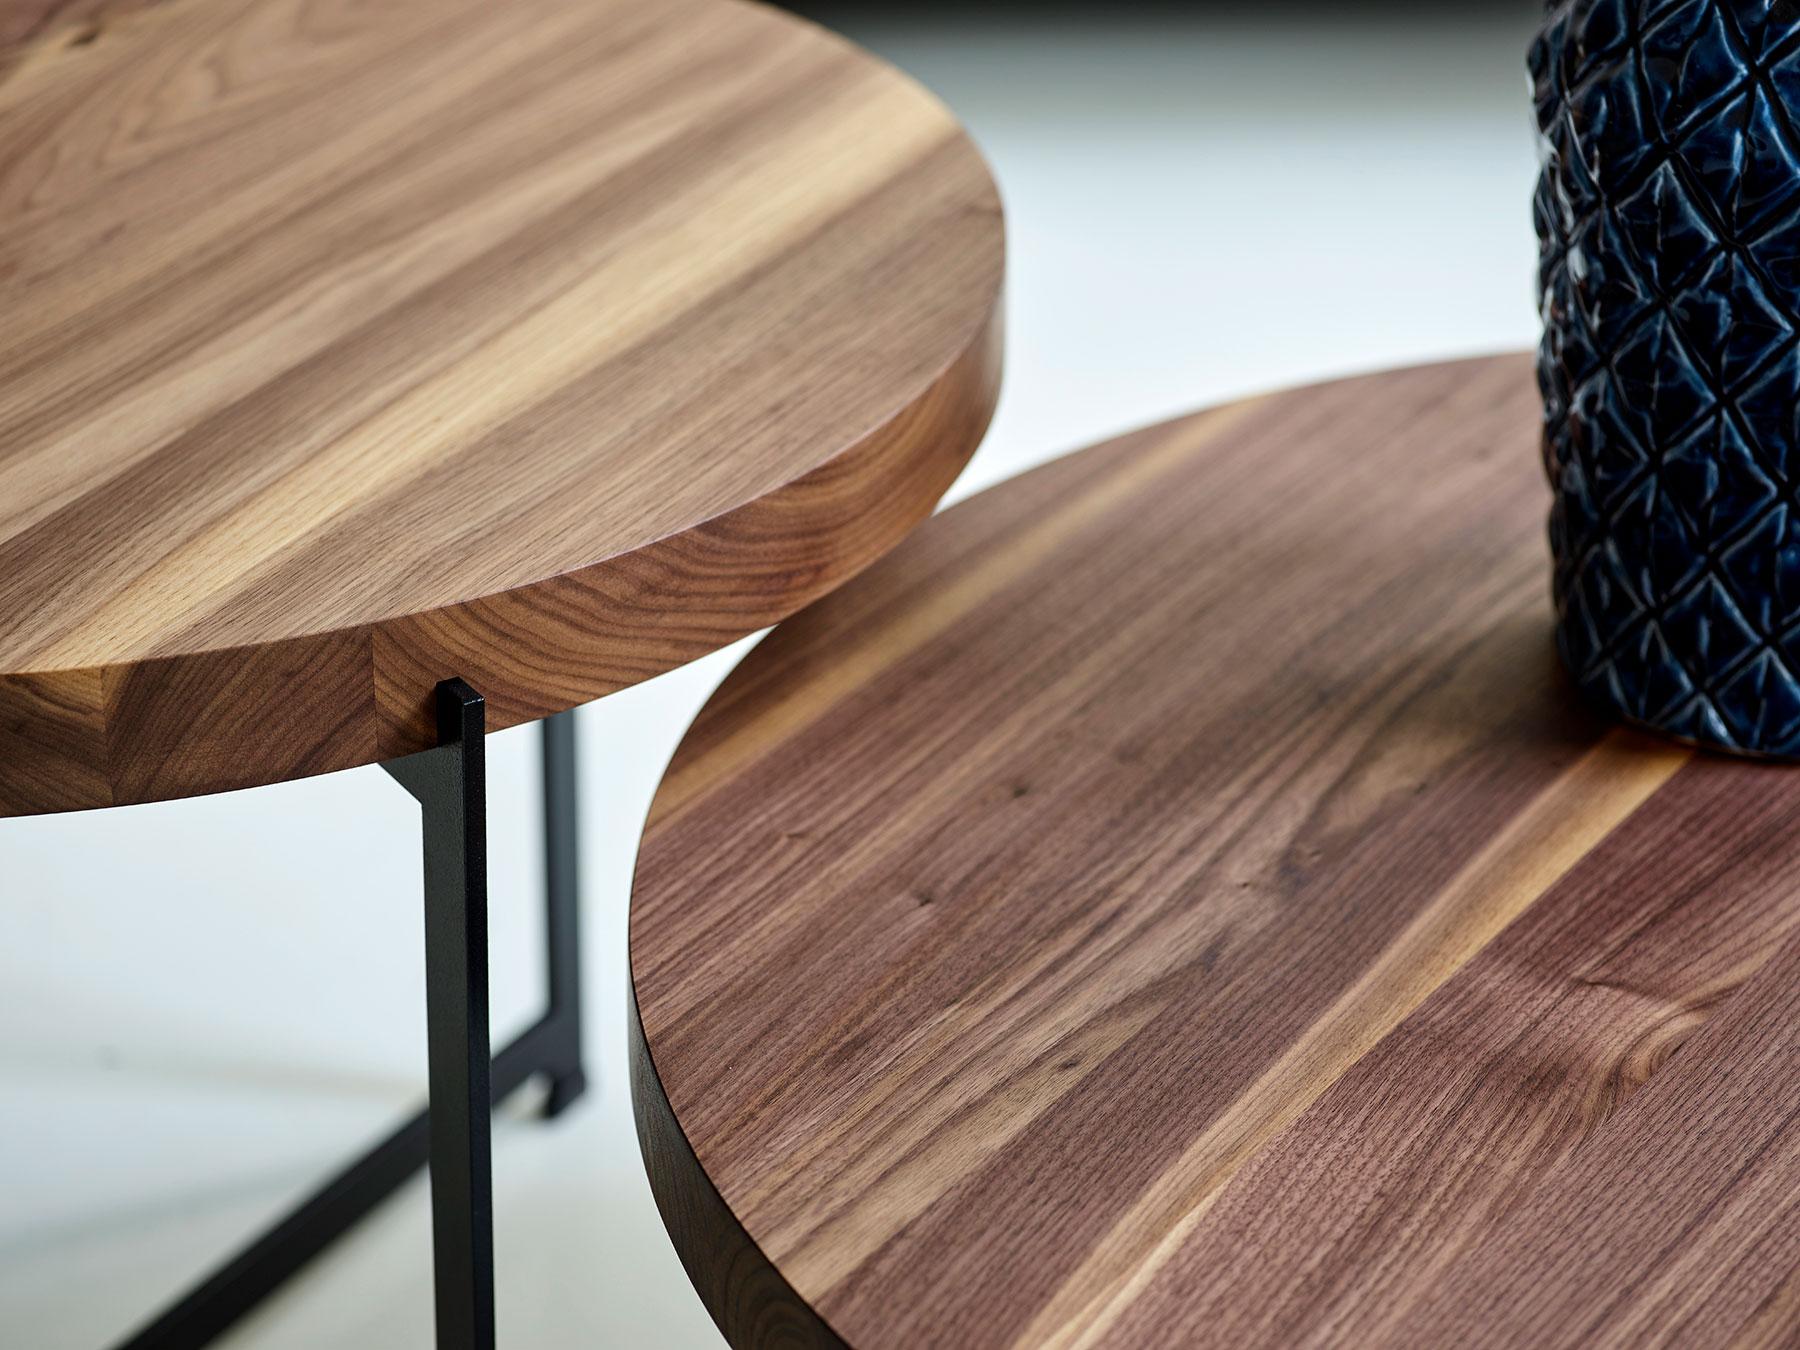 sorenrosestudio_plateau_table_closeup_dk3_lowweb.jpg